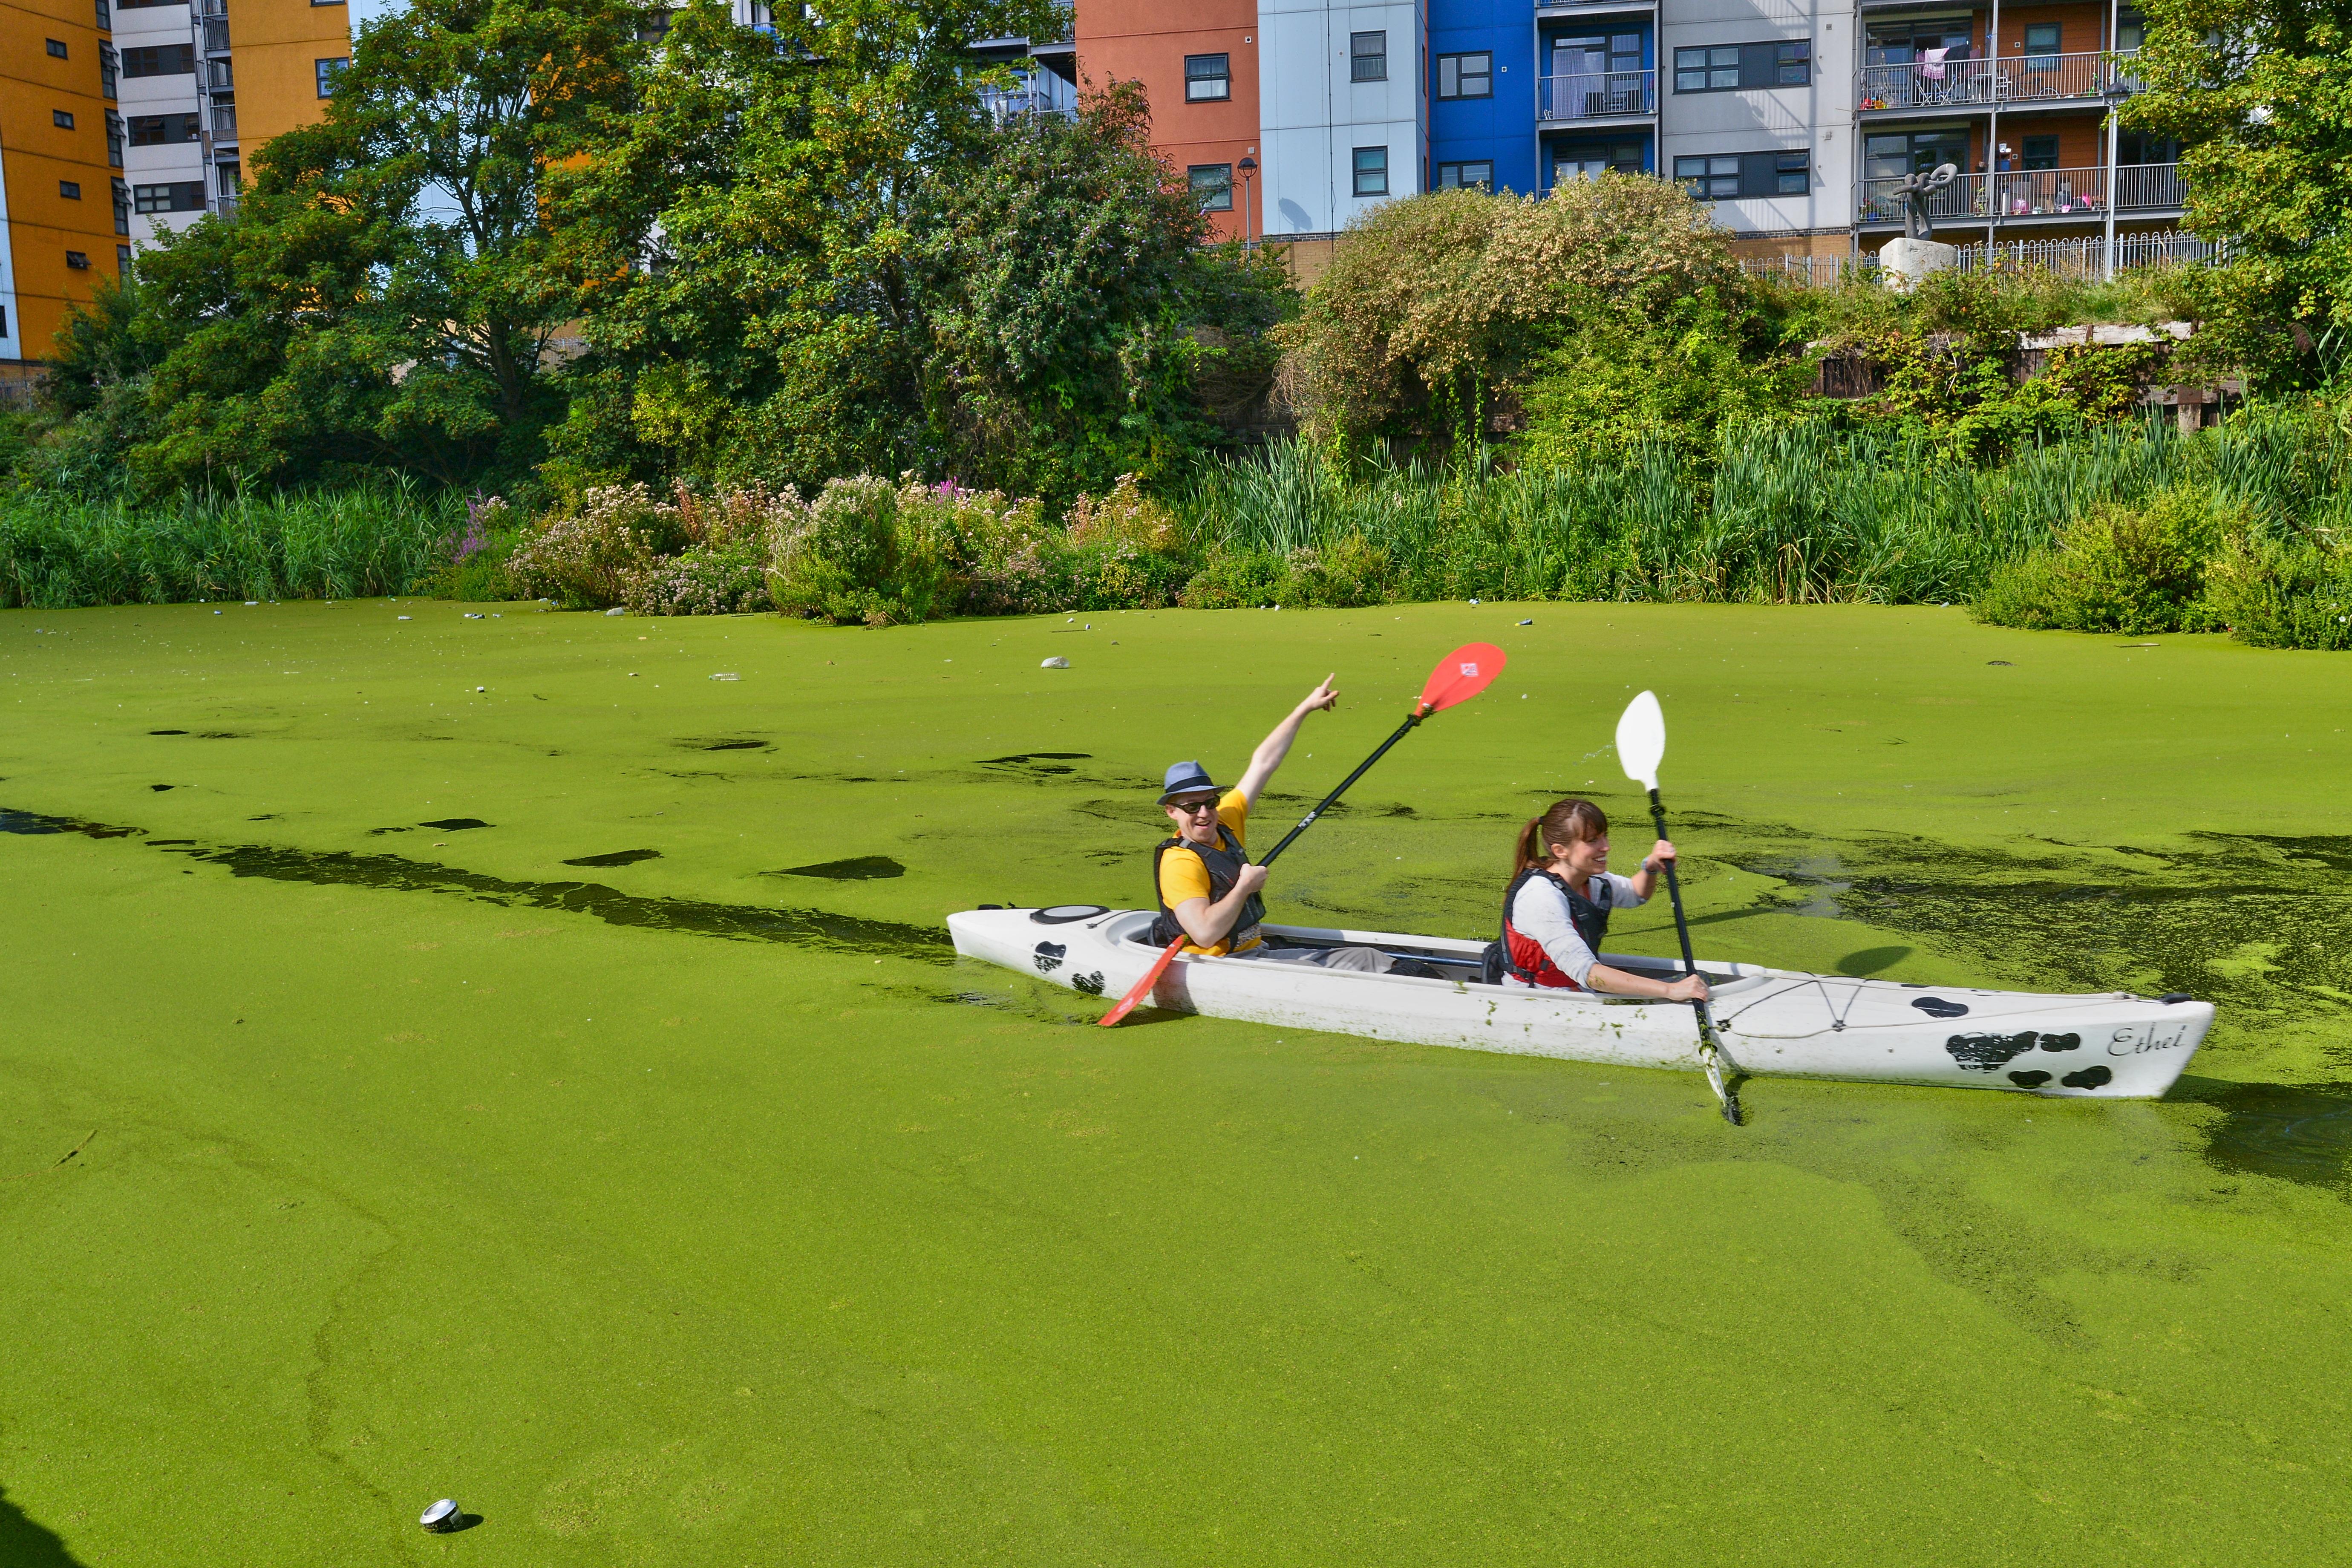 Toxic Algae Blooms Across the U.S.